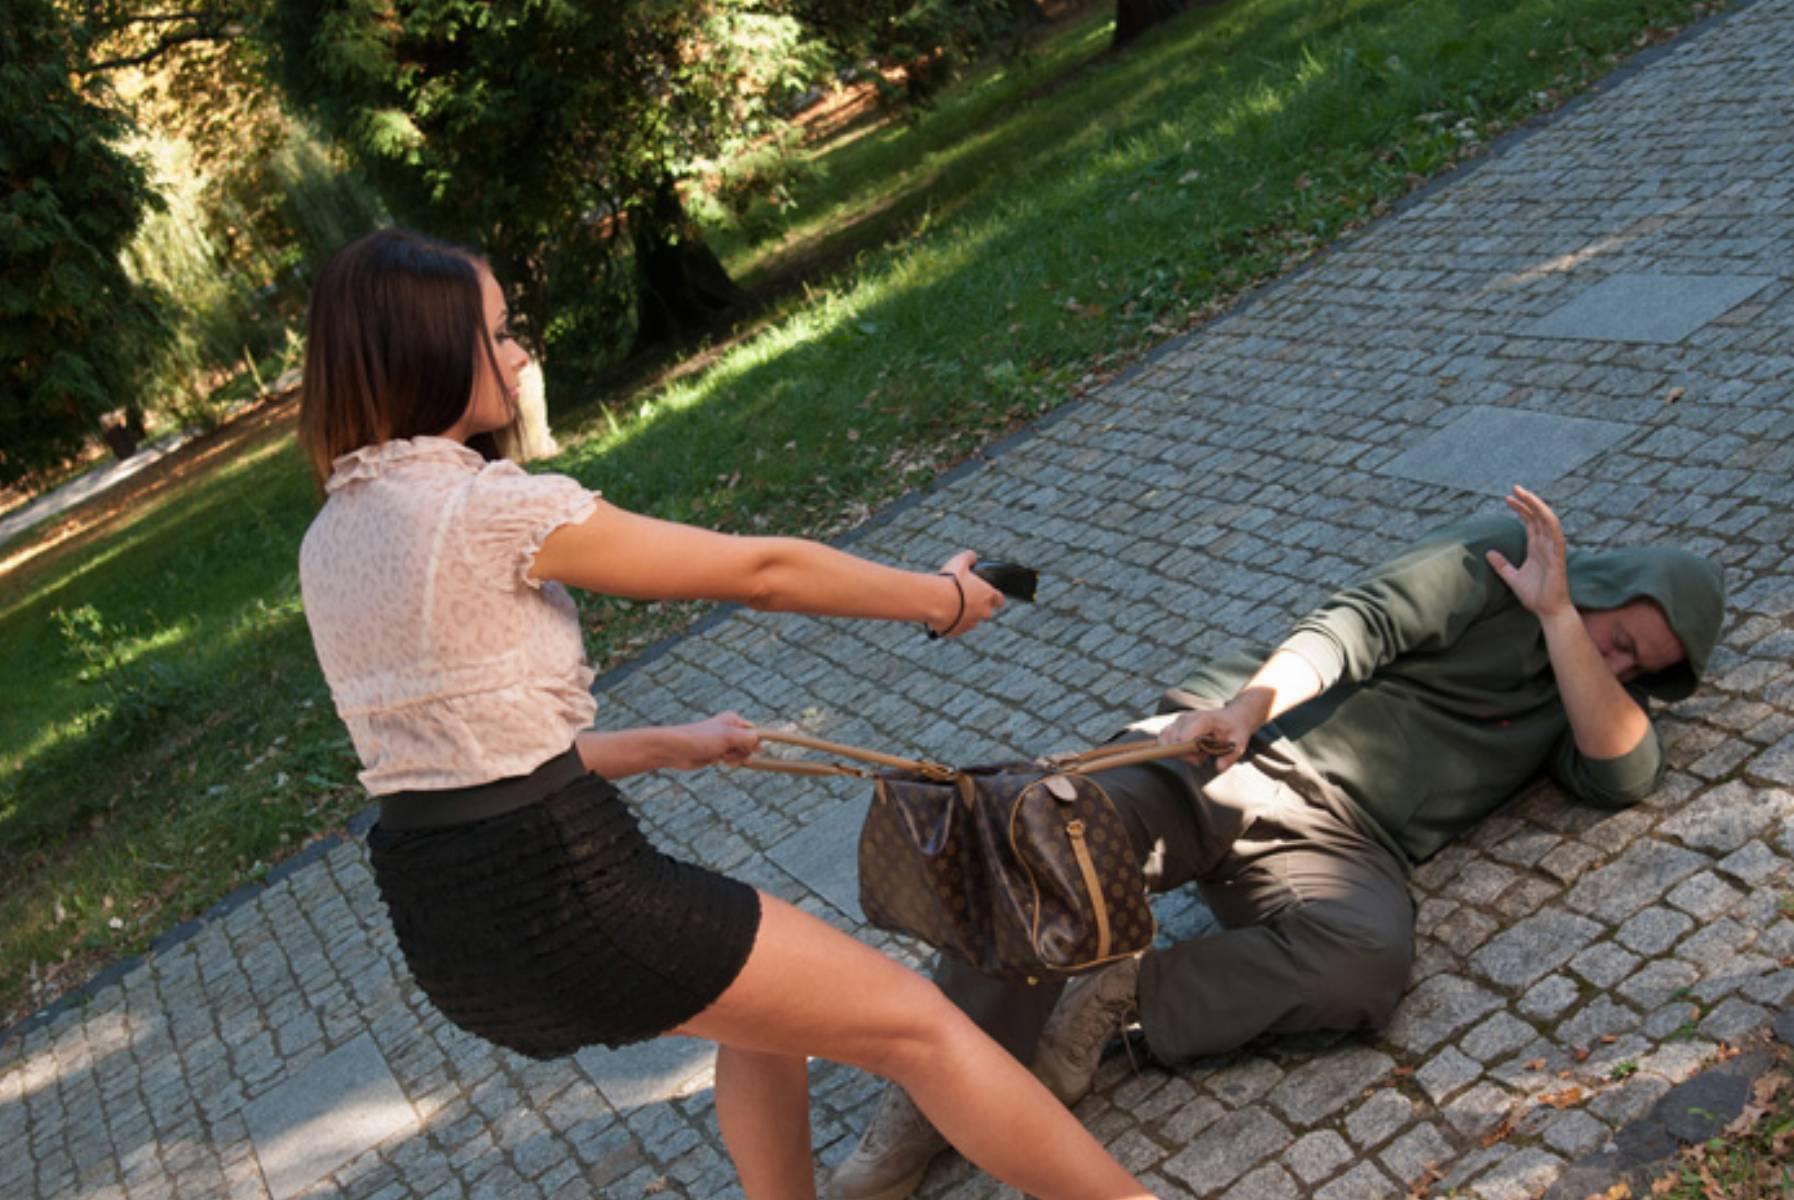 samoobrona dla kobiet (2)